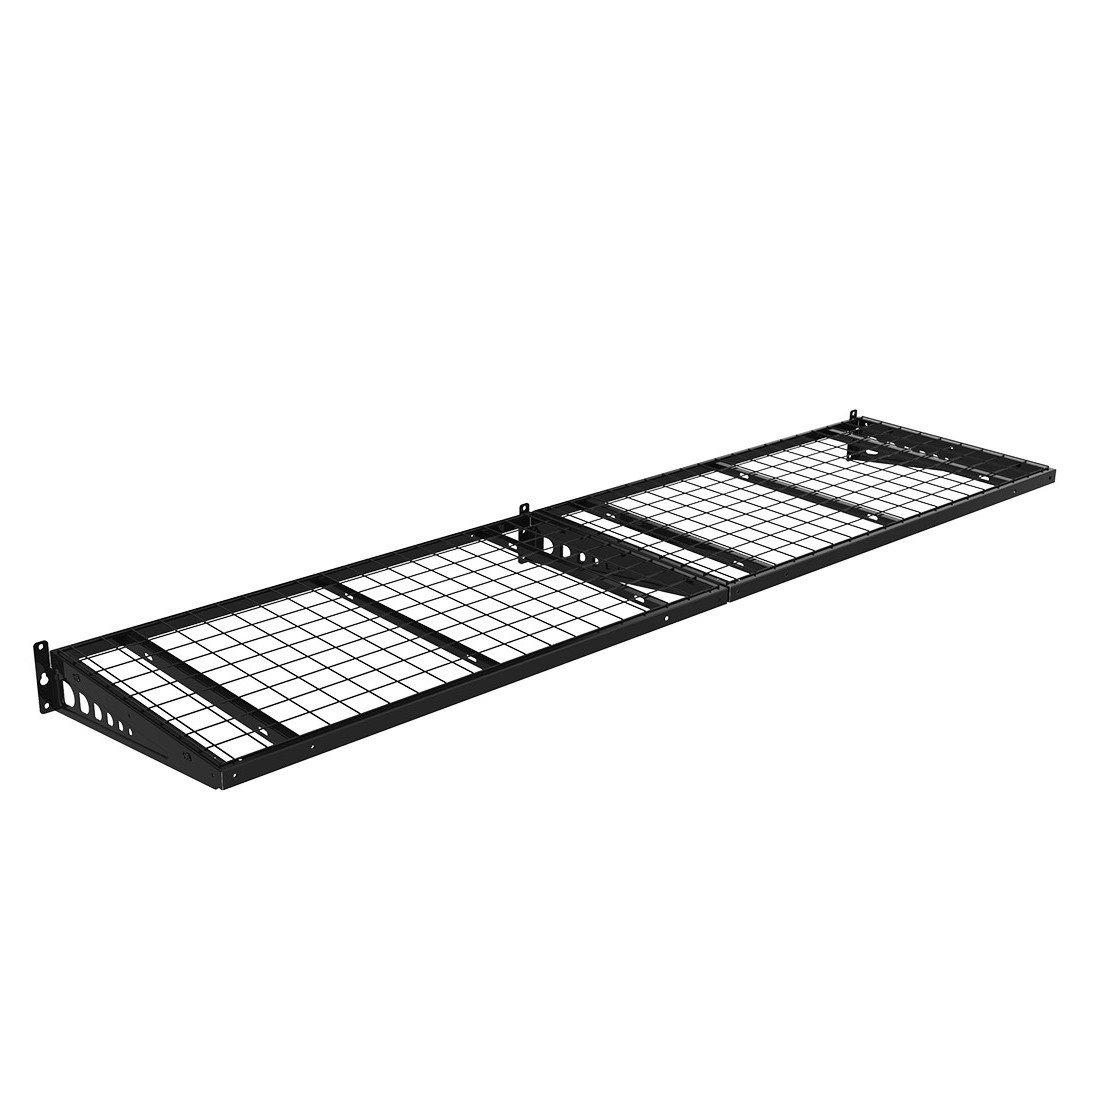 FLEXIMOUNTS 2x4ft 24-inch-by-48-inch Corner Wall Shelf Garage Storage Rack Floating Shelves, Black WRC24B